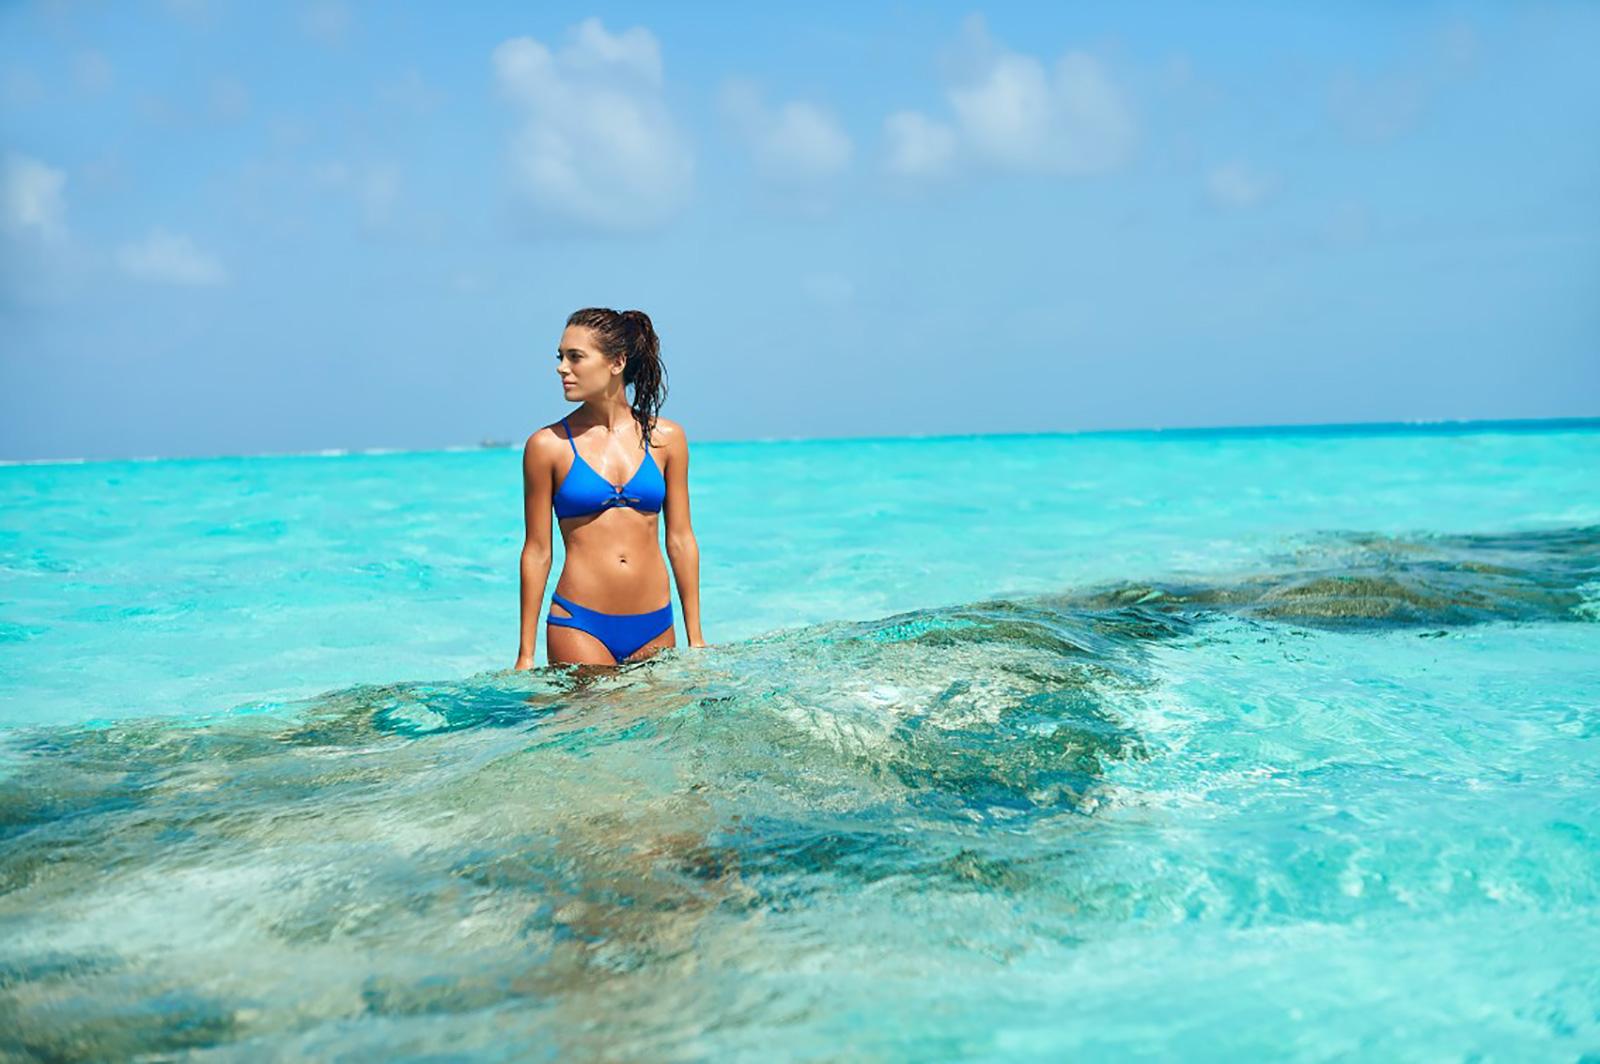 Plain Blue Bikini 90